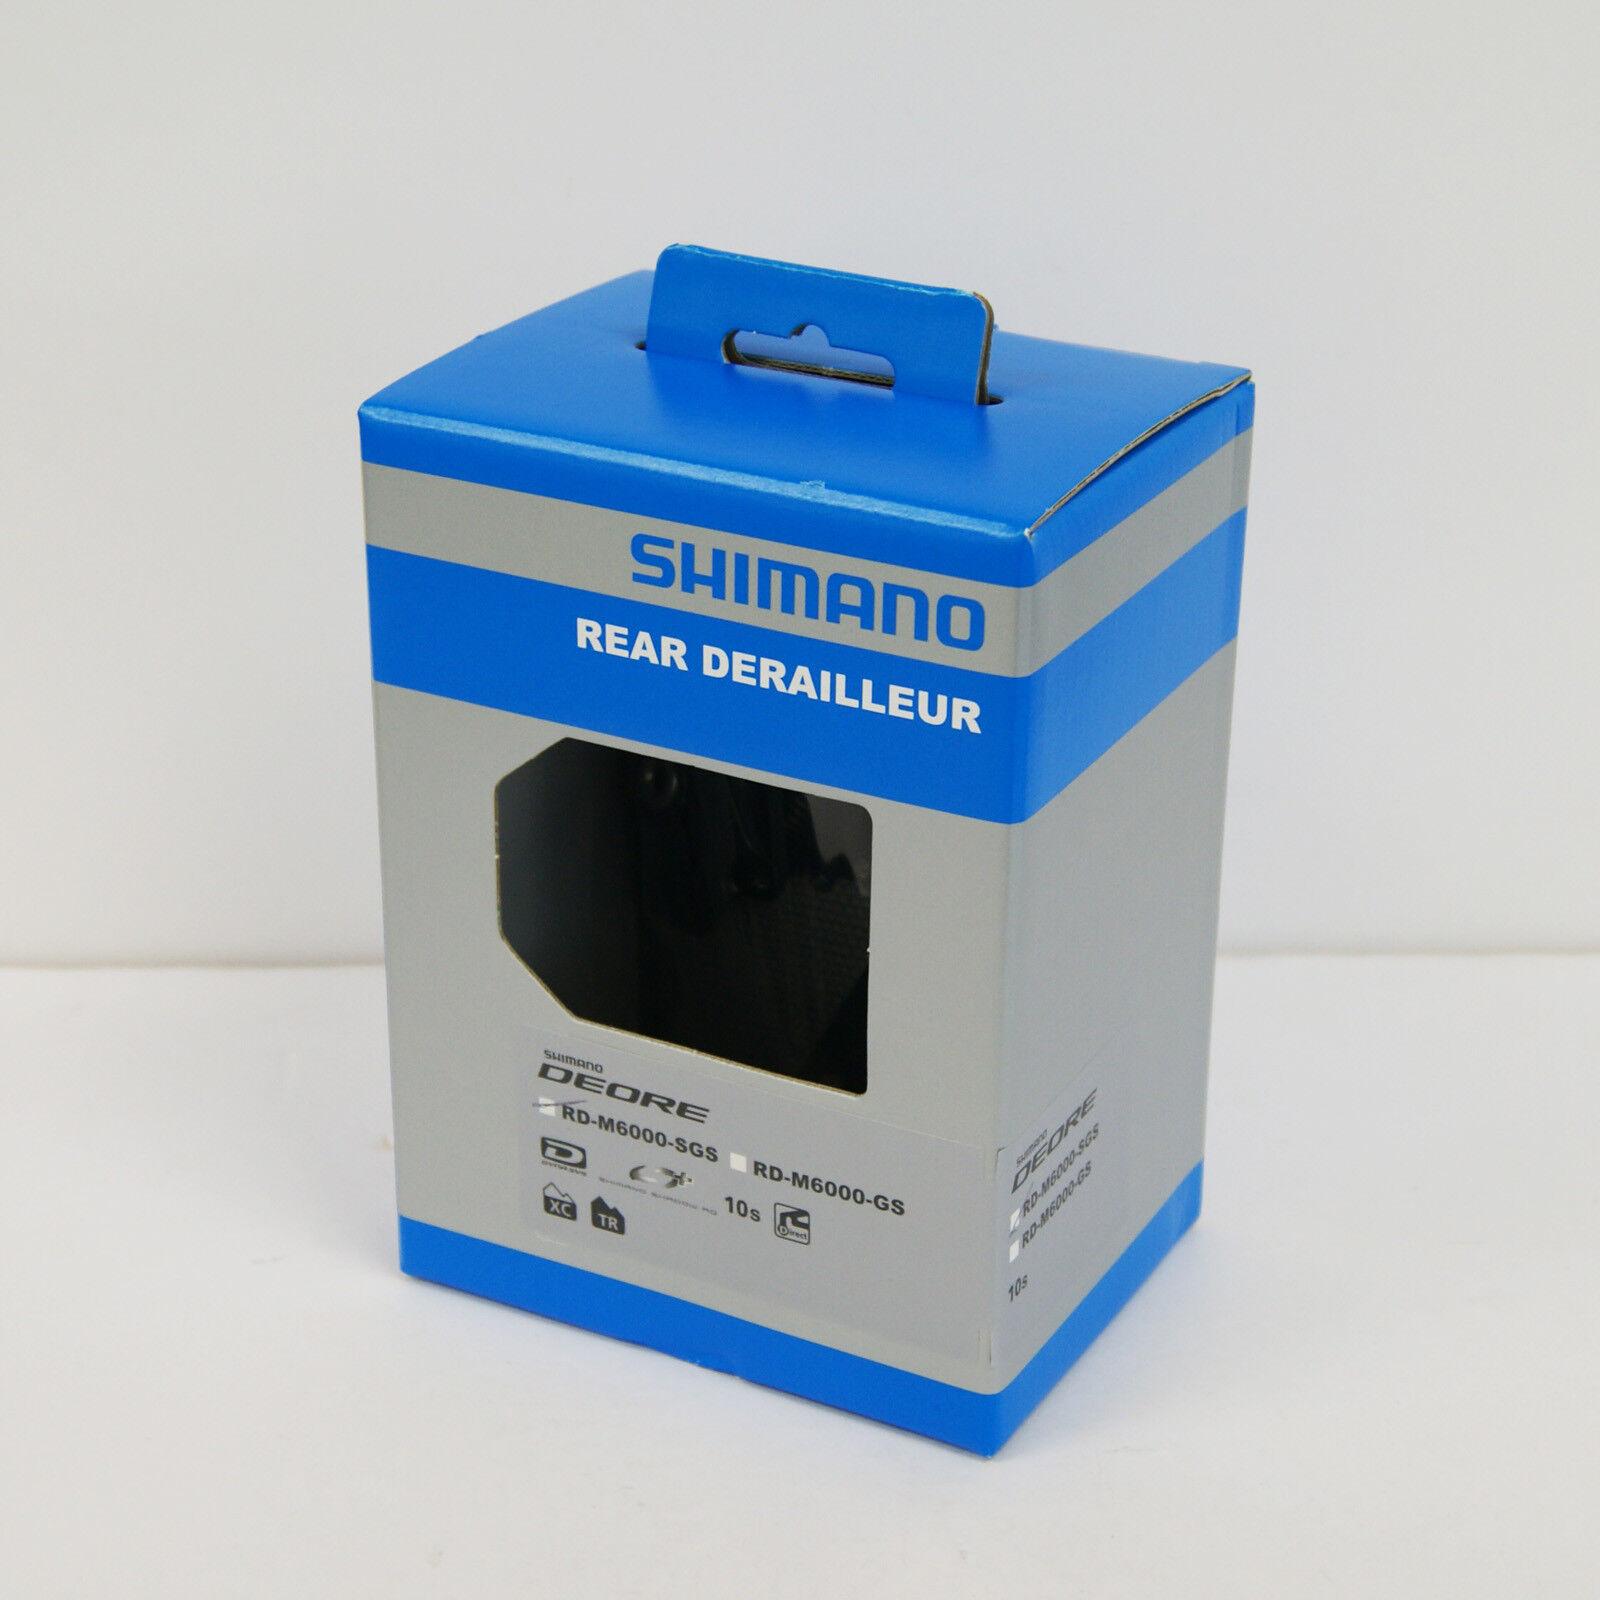 Shimano Deore RD-M6000-SGS Schatten Rd + Schaltwerk 10-Speed IRDM6000SGS